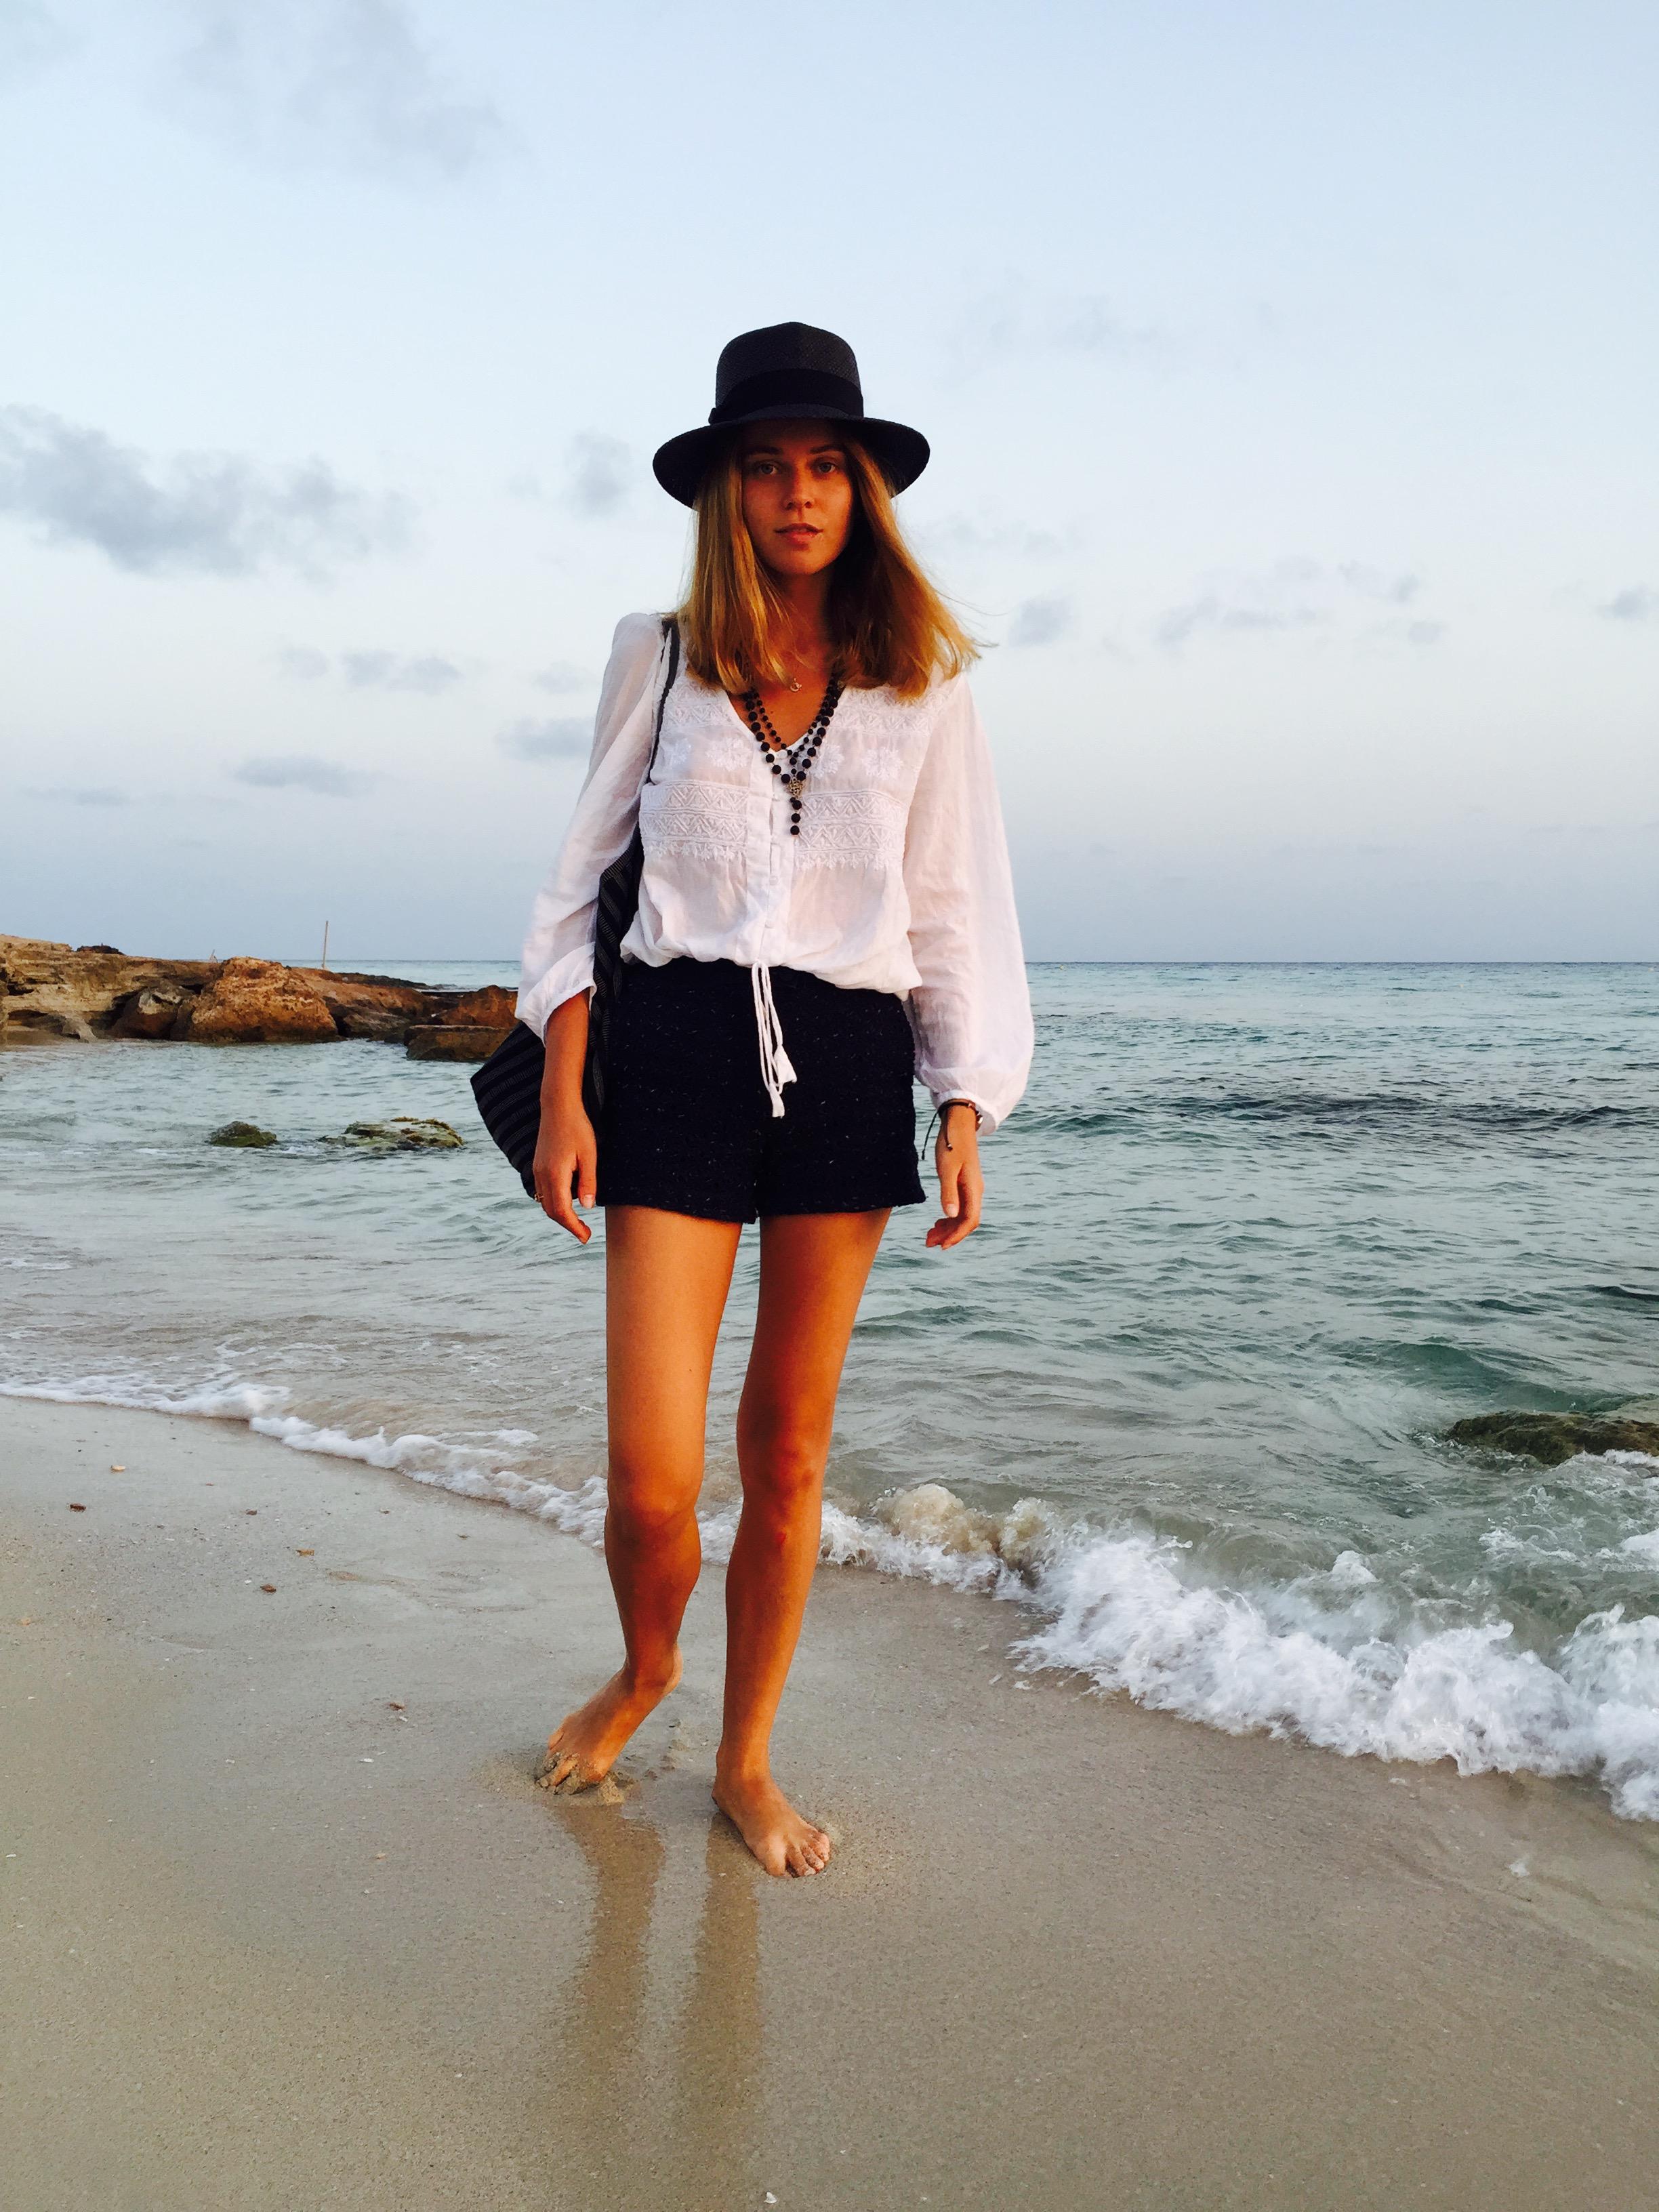 svetlana shashkova barefoot walk